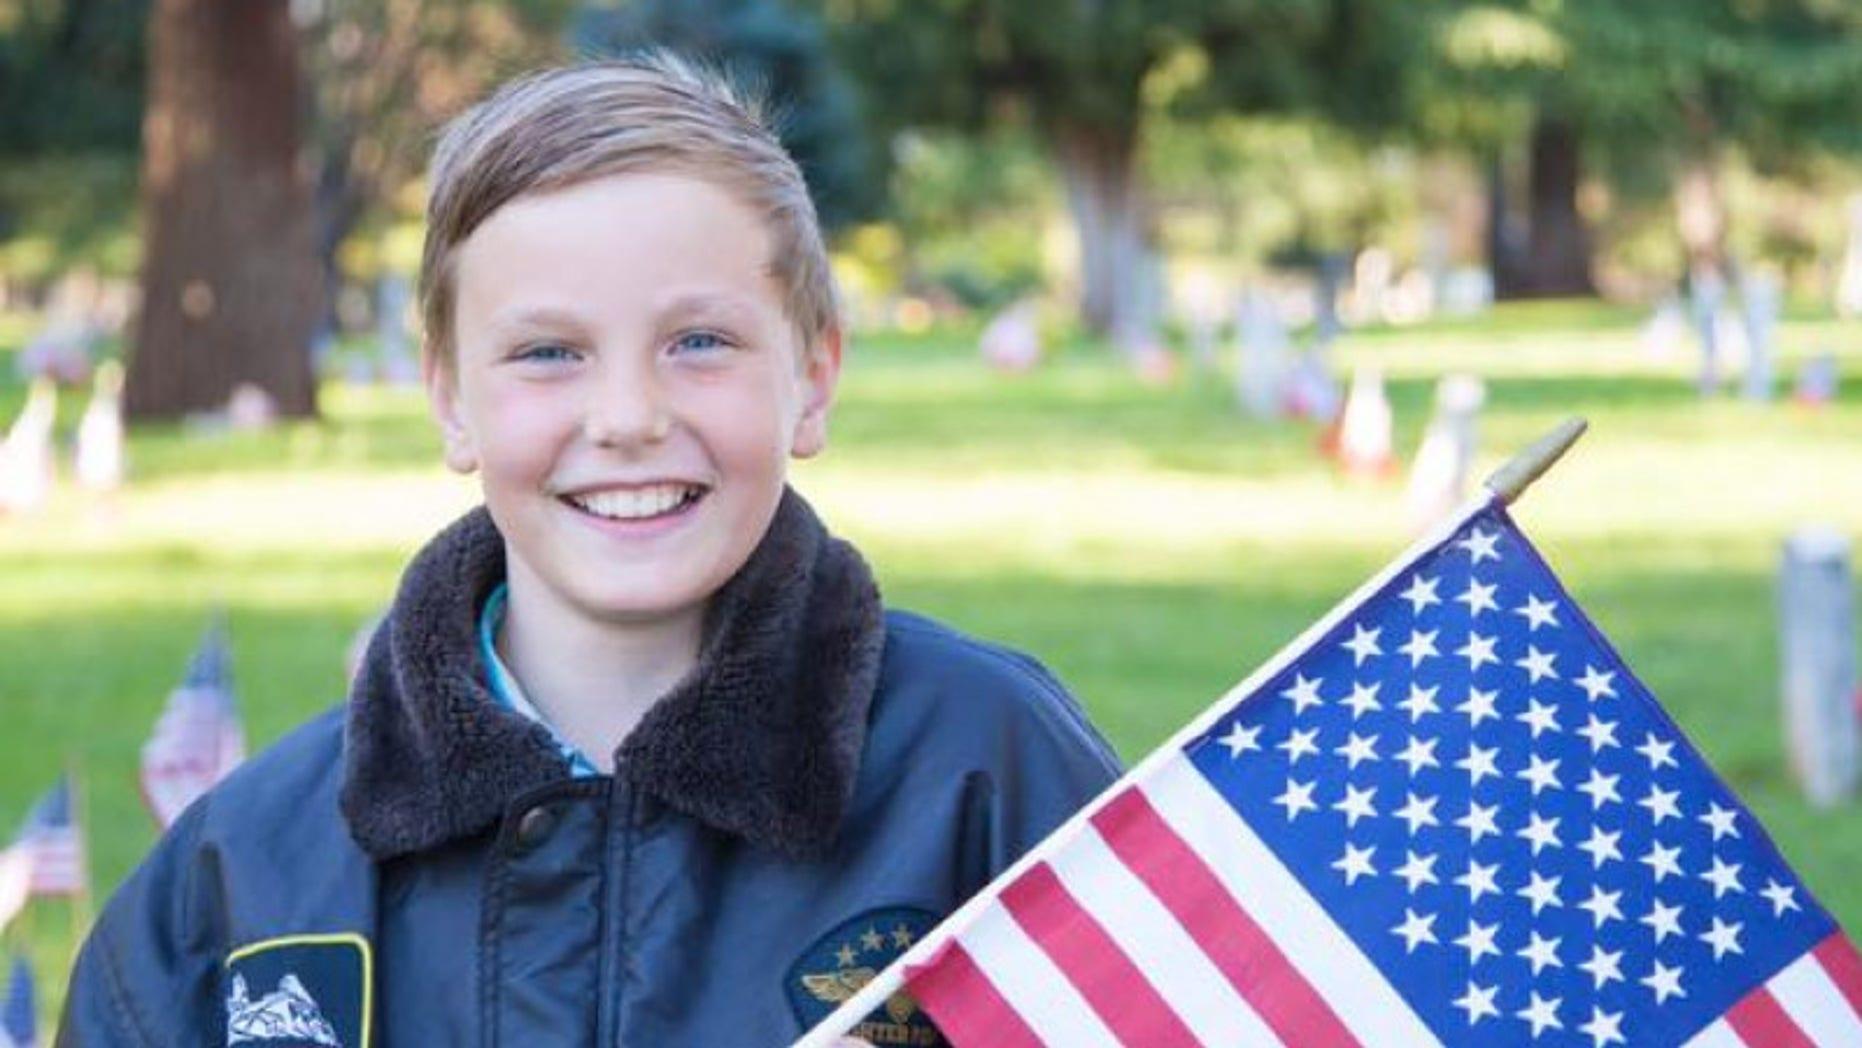 Preston Sharp is raising money to help honor veterans in California.